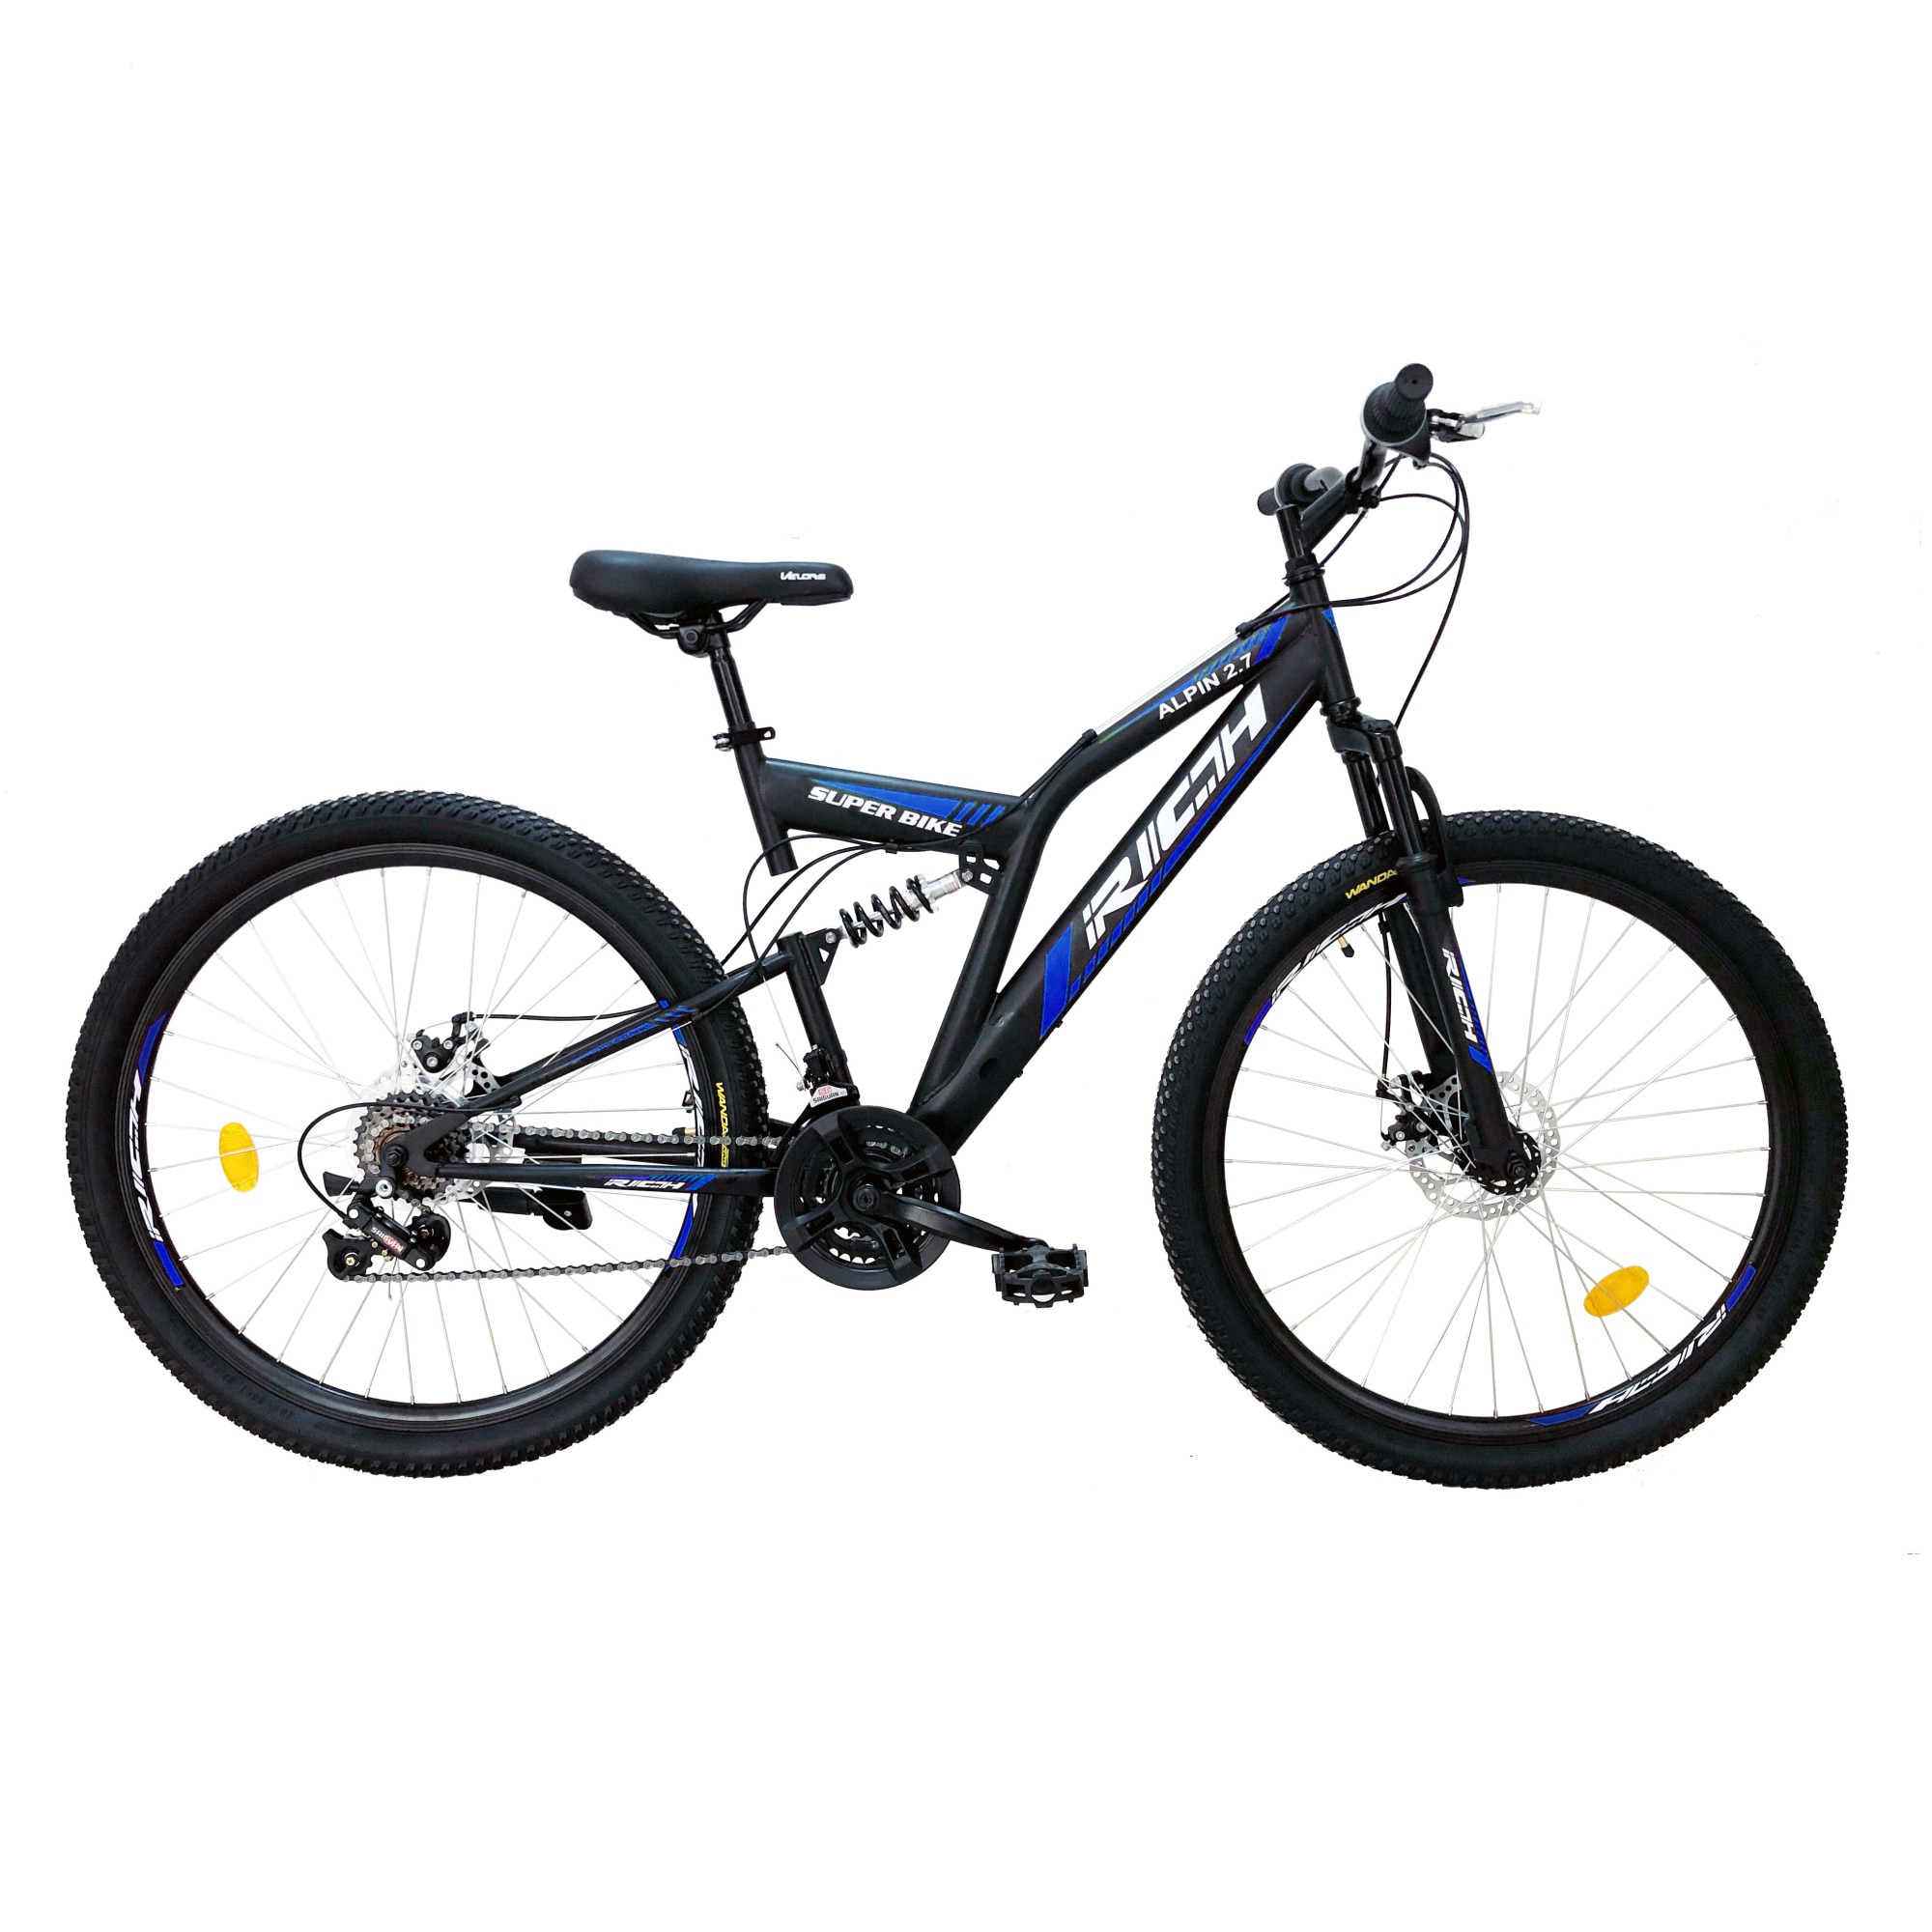 "Fotografie Bicicleta MTB Rich 27.5"" R2750D FS, Negru/Alb/Albastru"